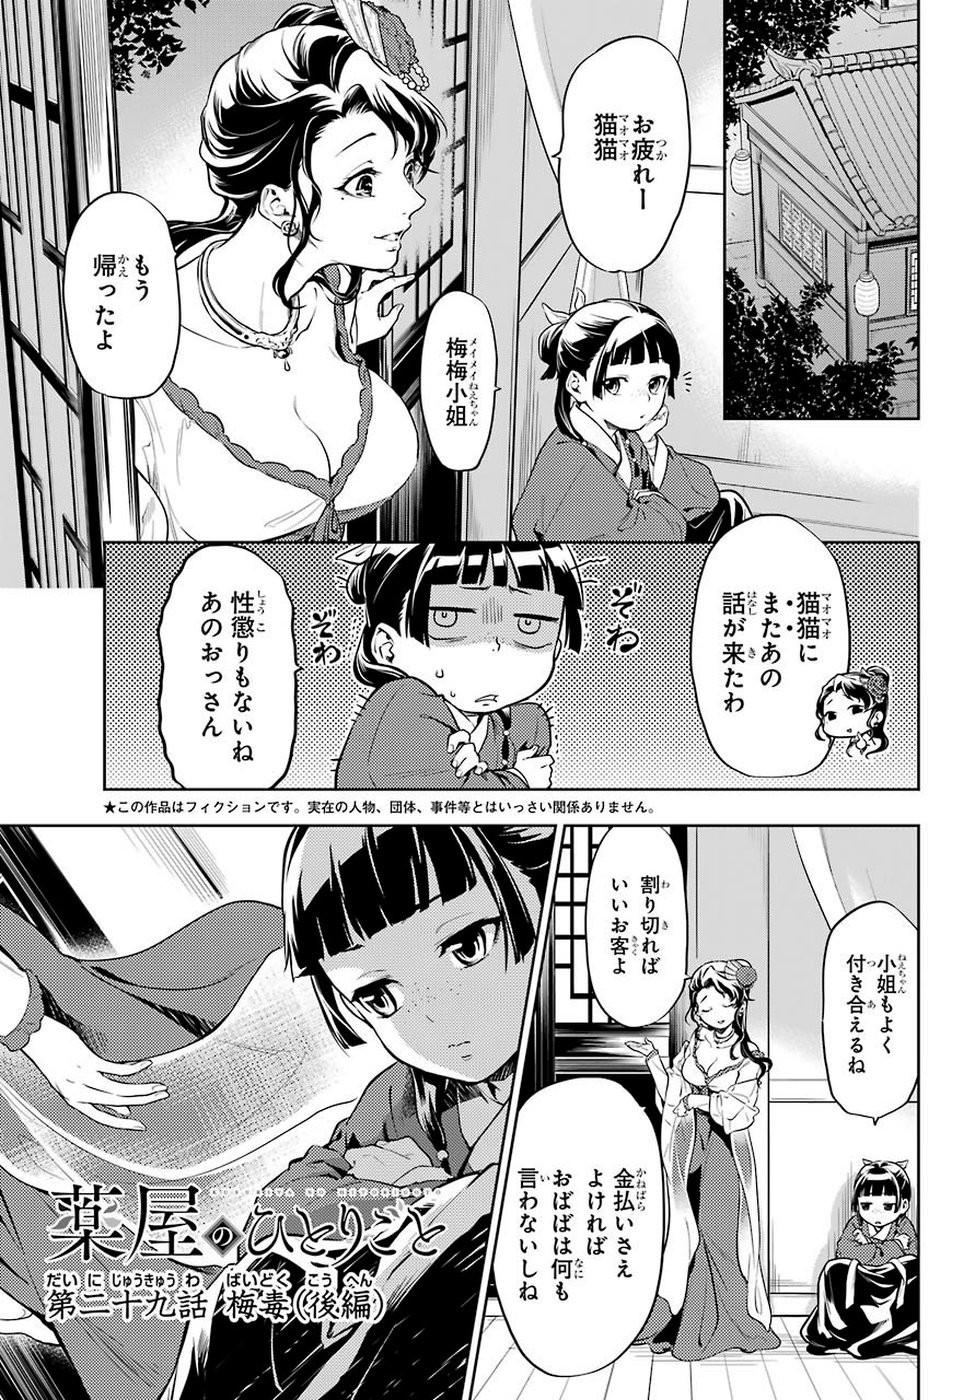 Kusuriya-no-Hitorigoto - Chapter 29.1 - Page 1